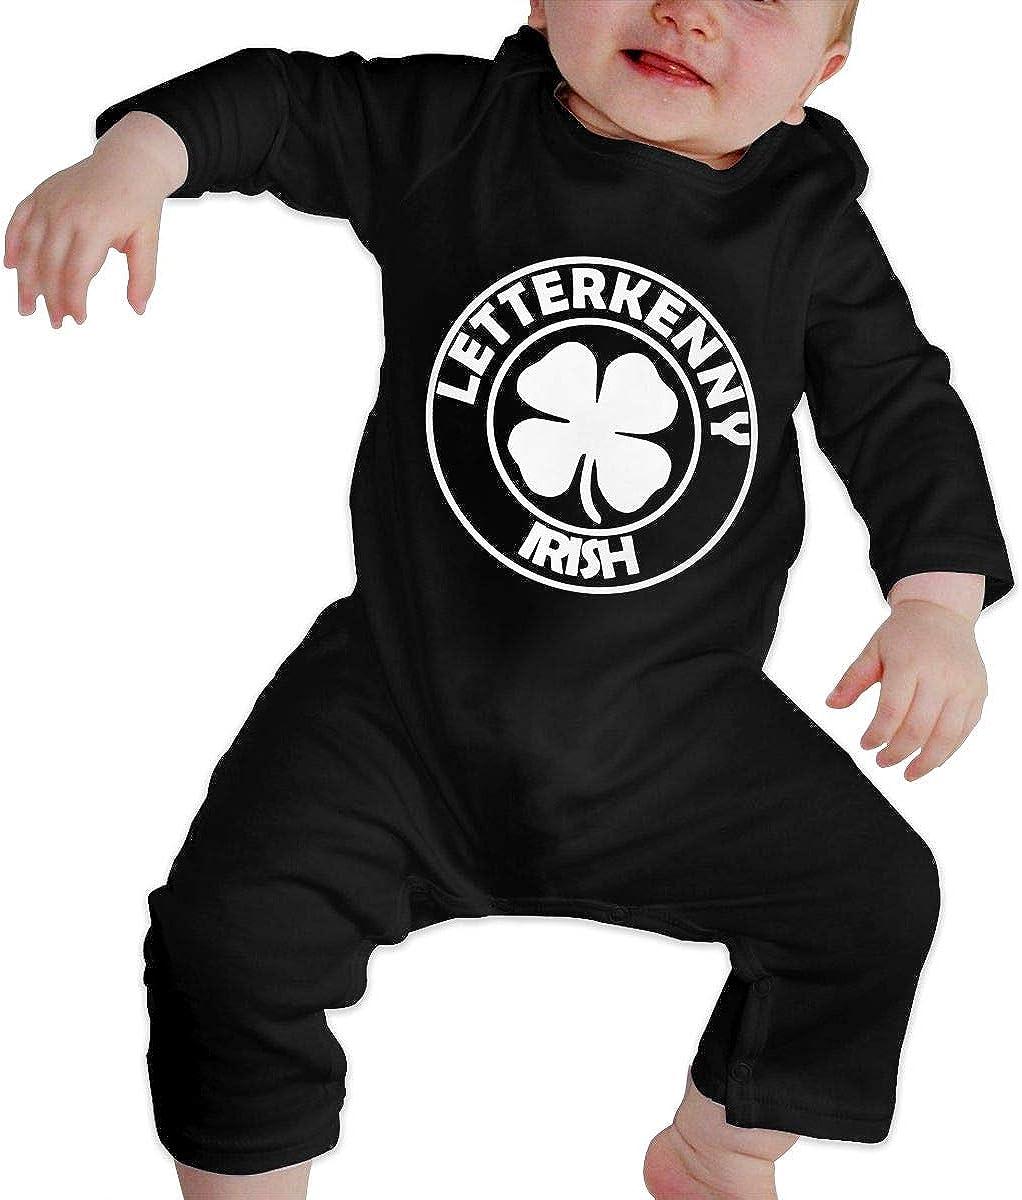 MiNgosRY Letterkenny-Irish Newborn Baby Long Sleeve Bodysuits Rompers Outfits